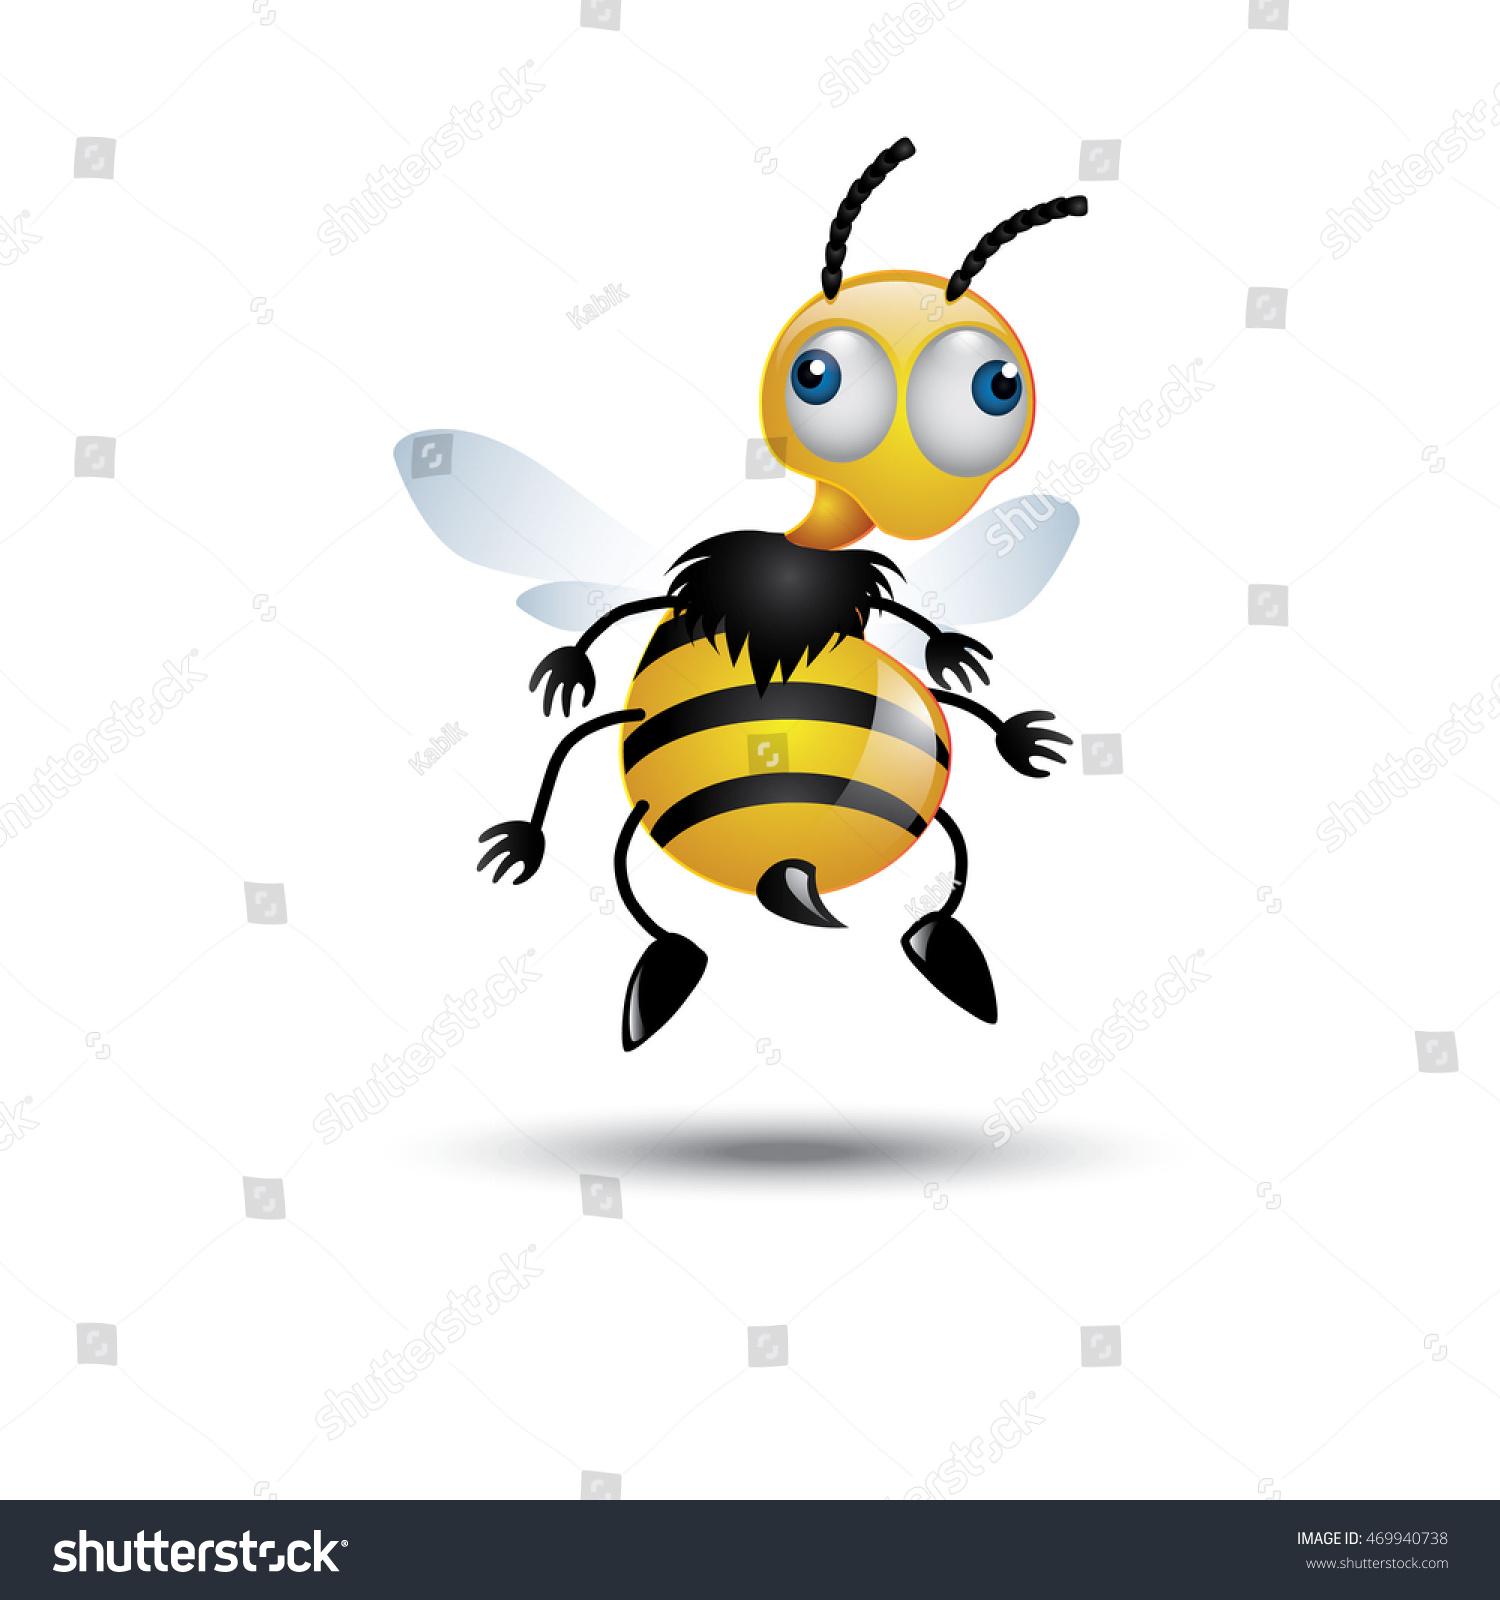 Funny Bee Stock Vektorgrafik Lizenzfrei 469940738 Shutterstock